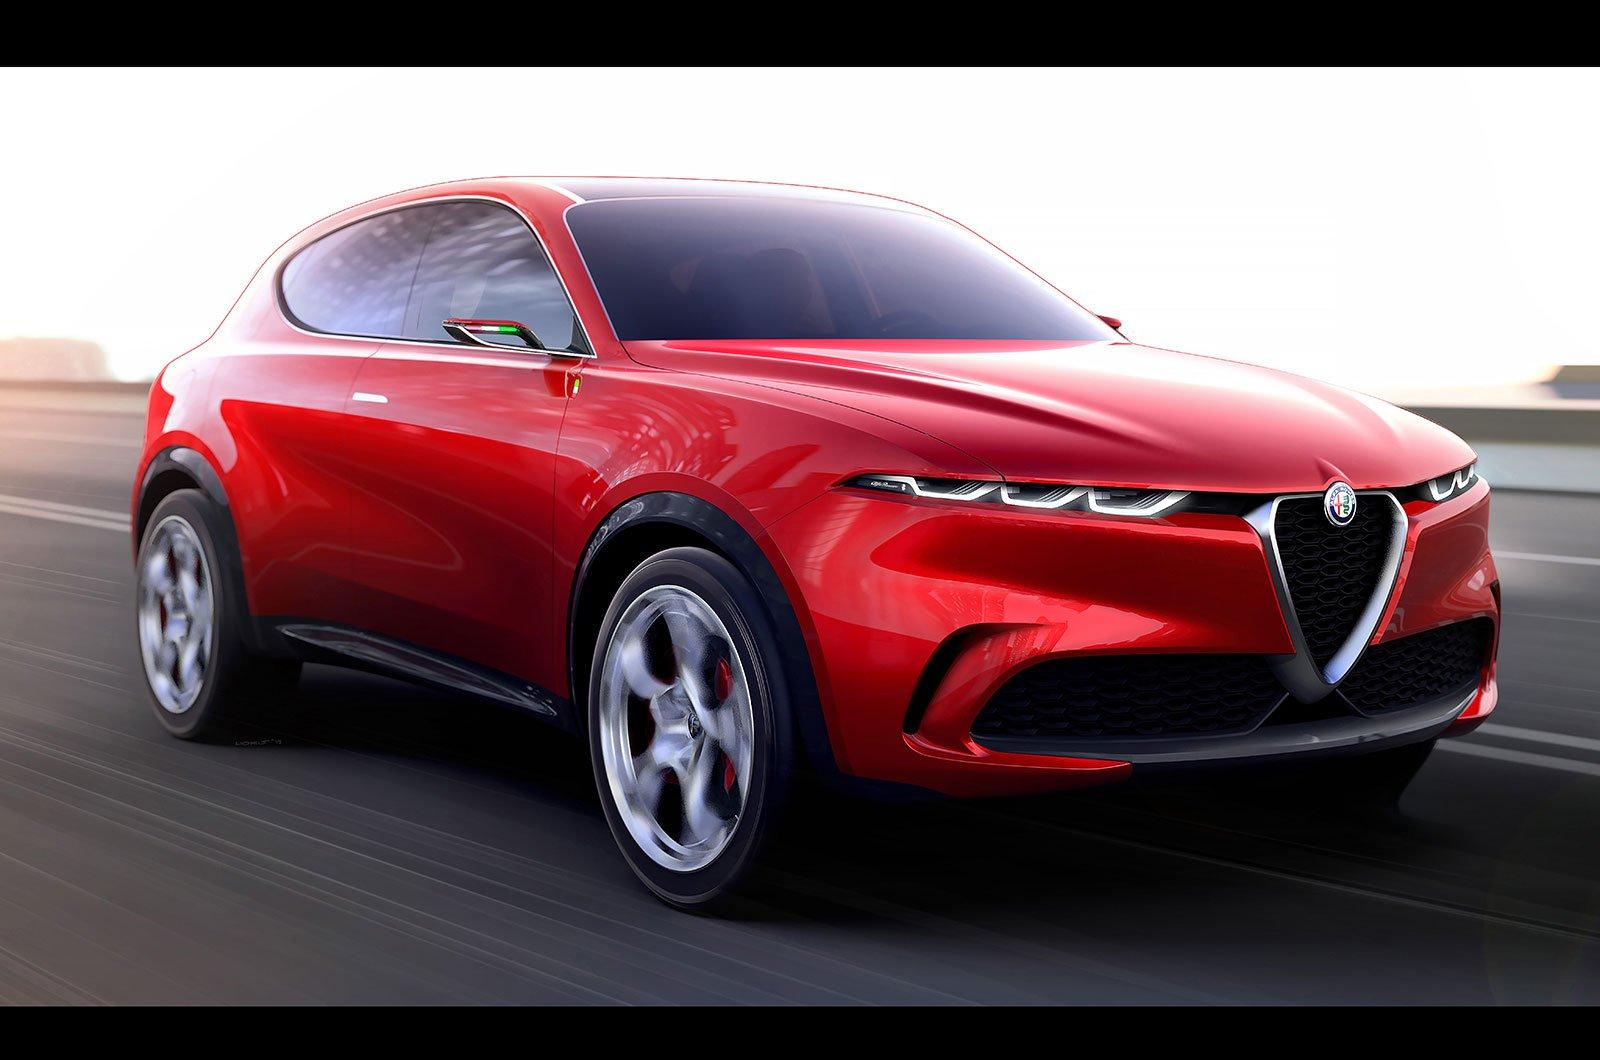 2021 Alfa Romeo Tonale SUV: price, specs and release date